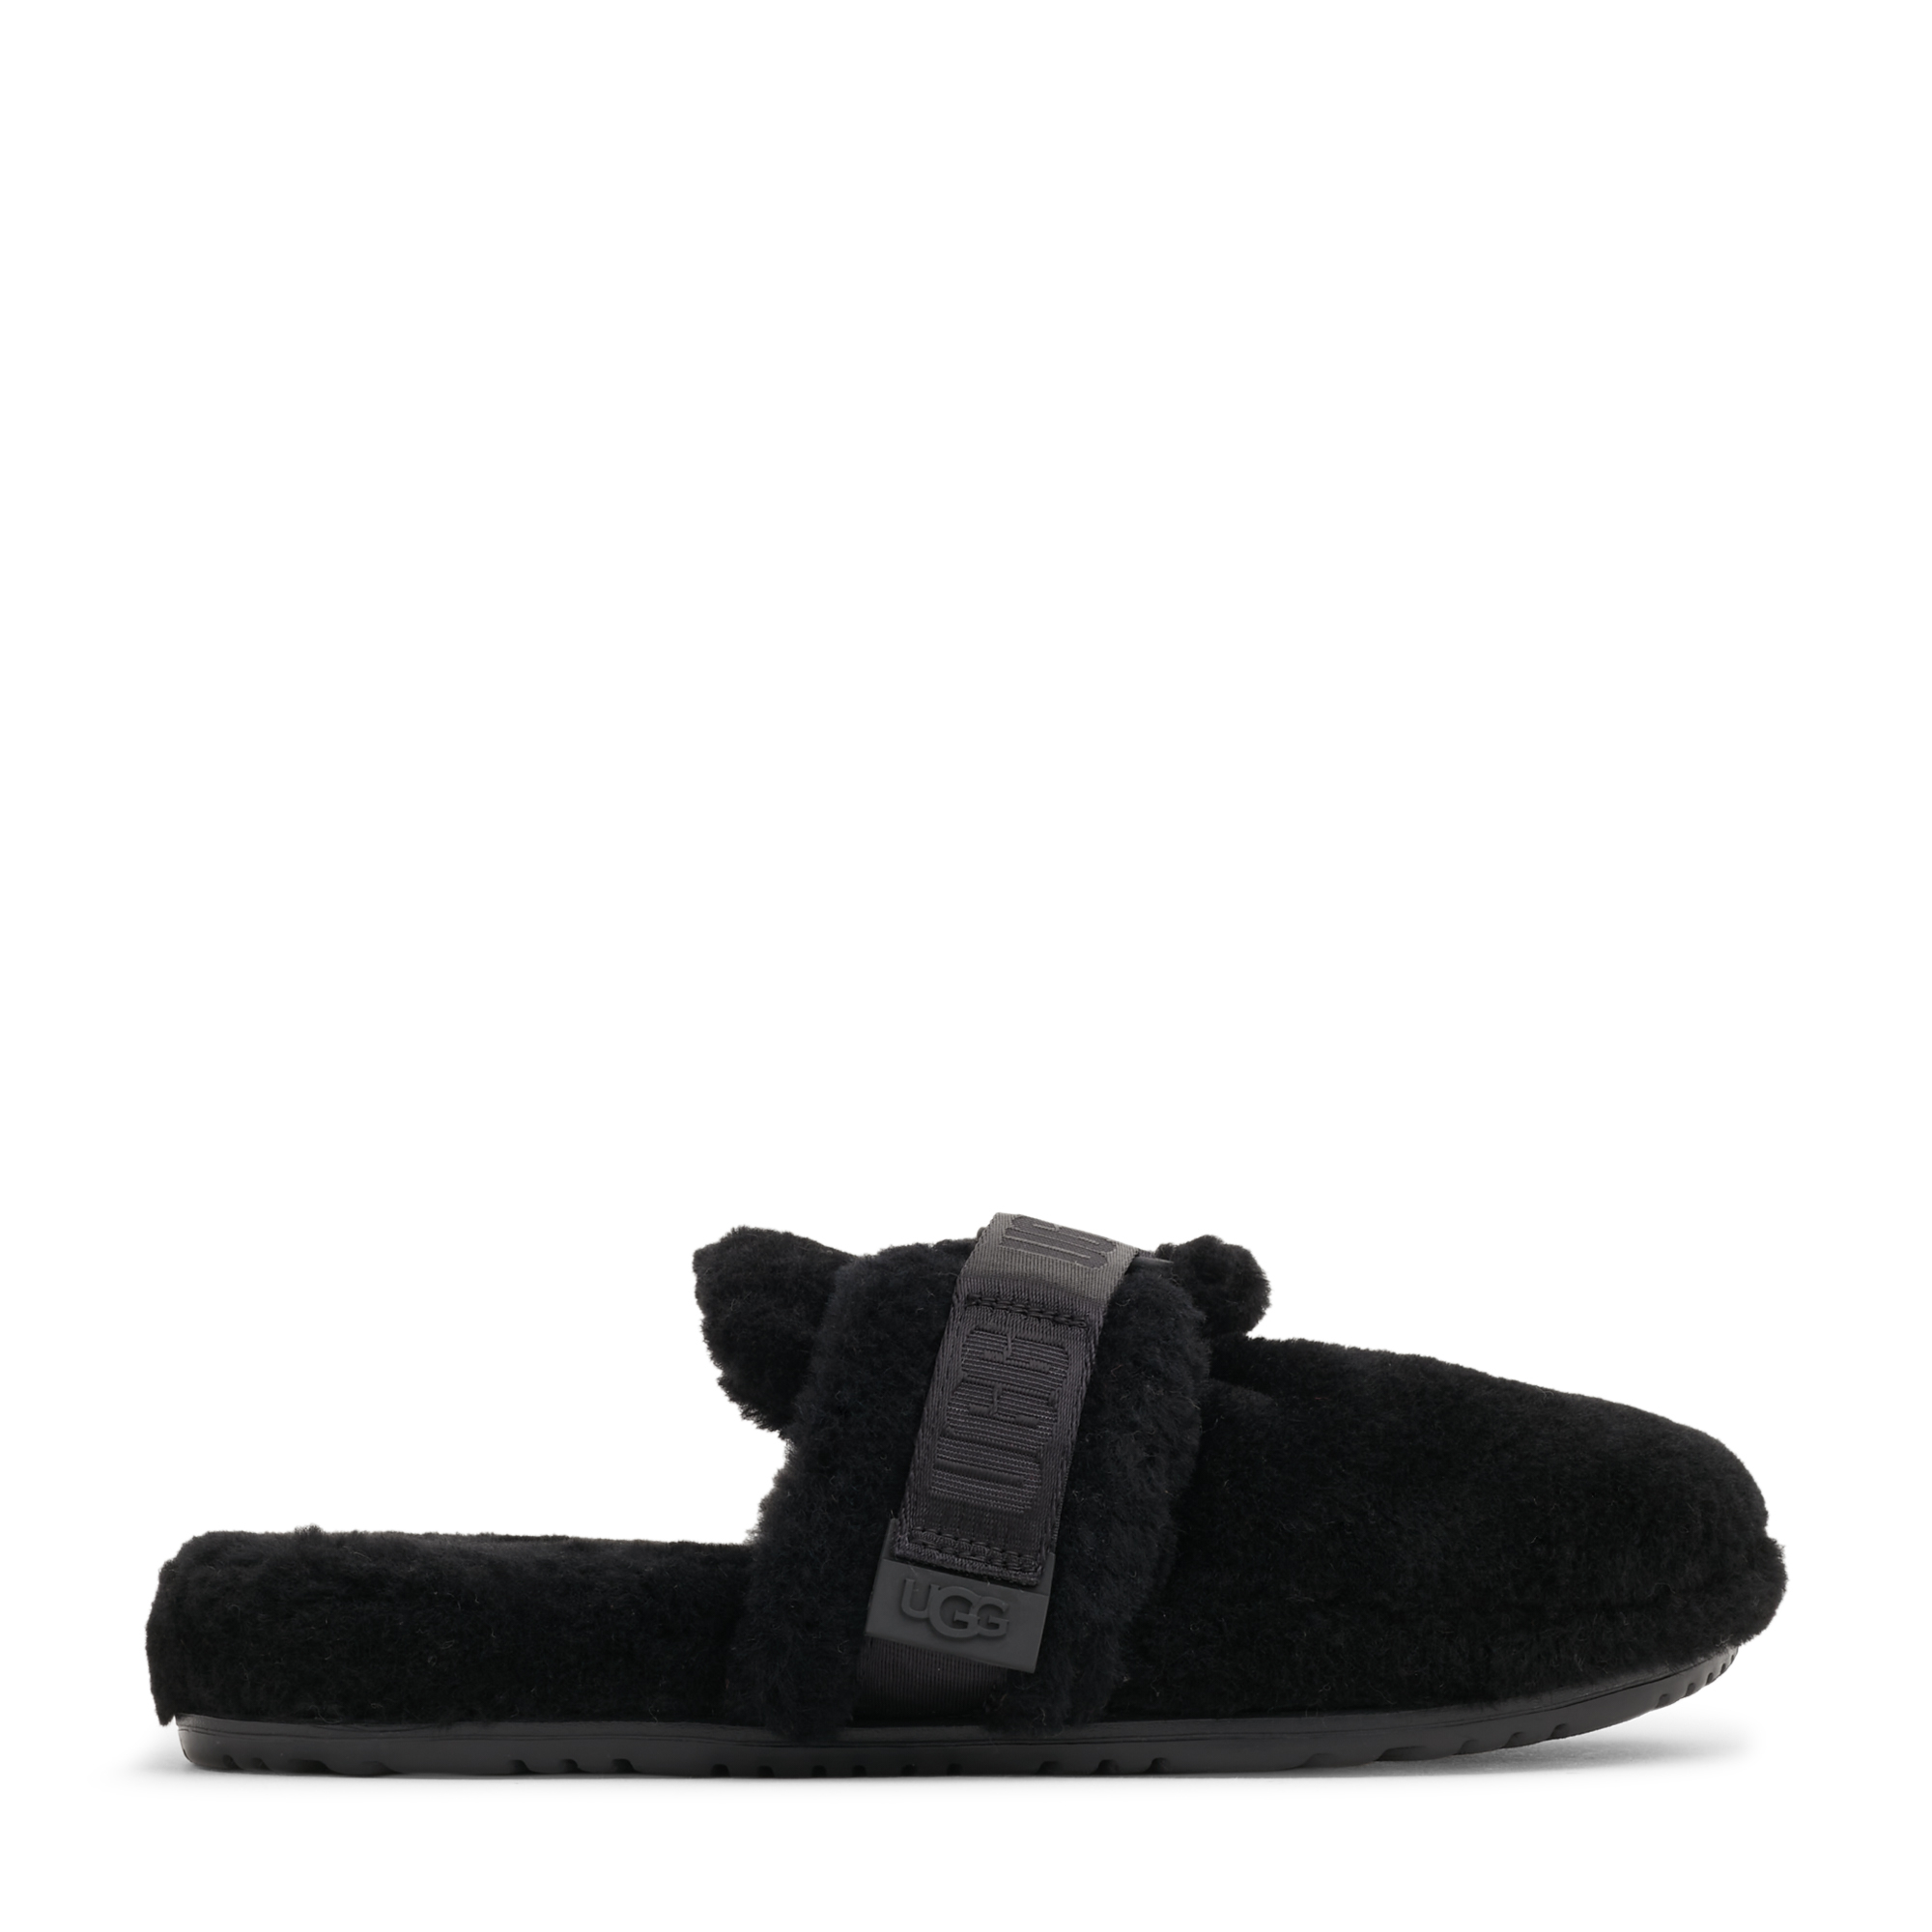 Fluff It slippers